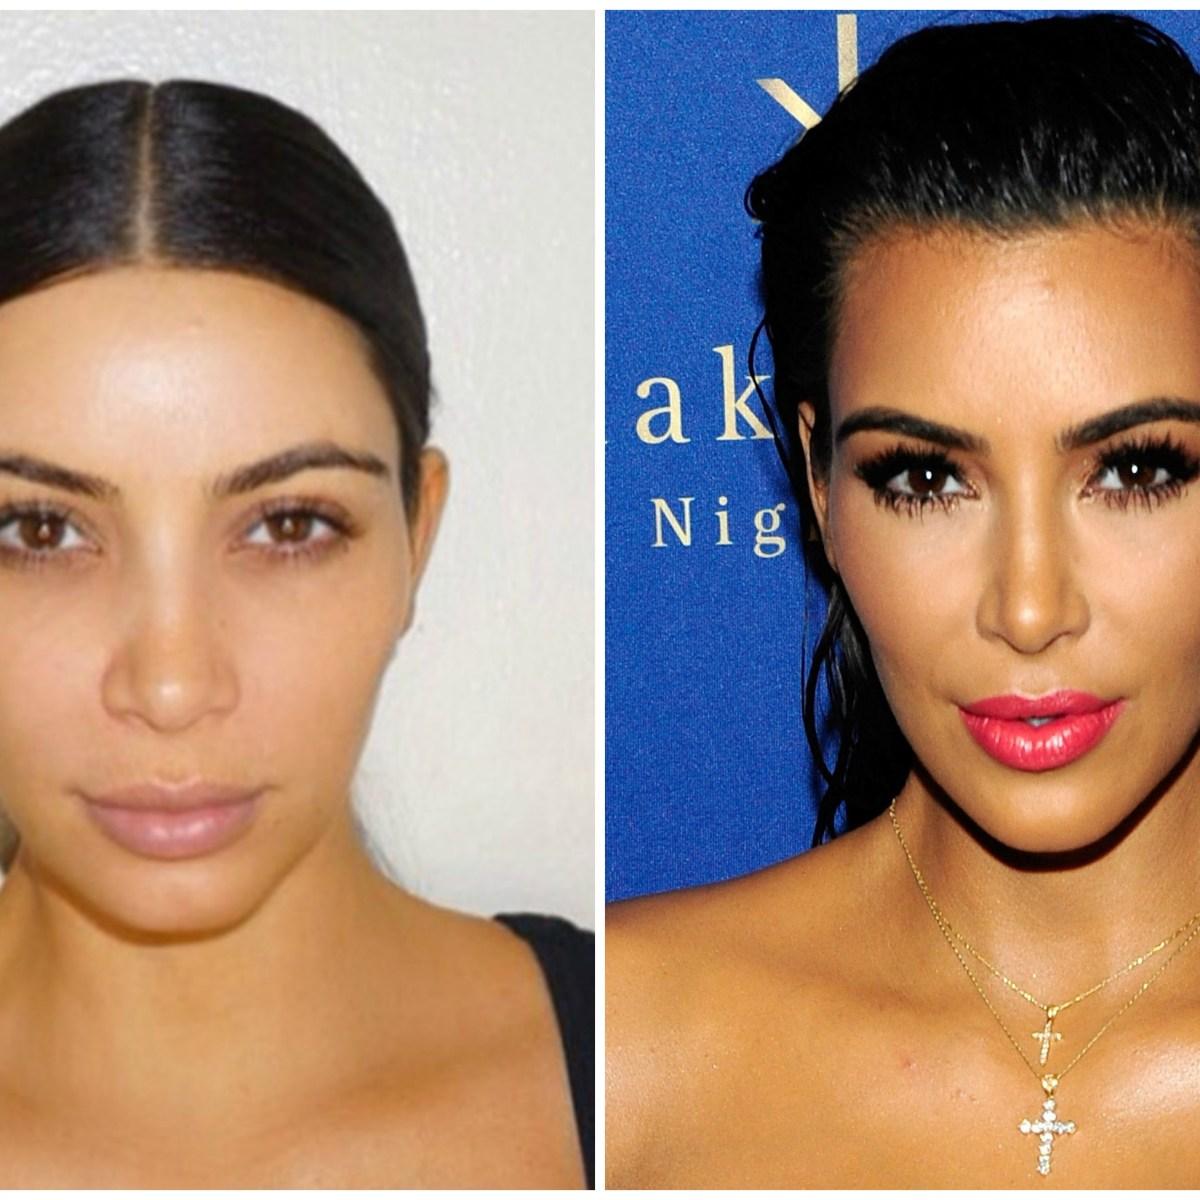 Kim Kardashian Without Makeup See The Celebs Surprising Cosmetic - Kim-k-without-makeup